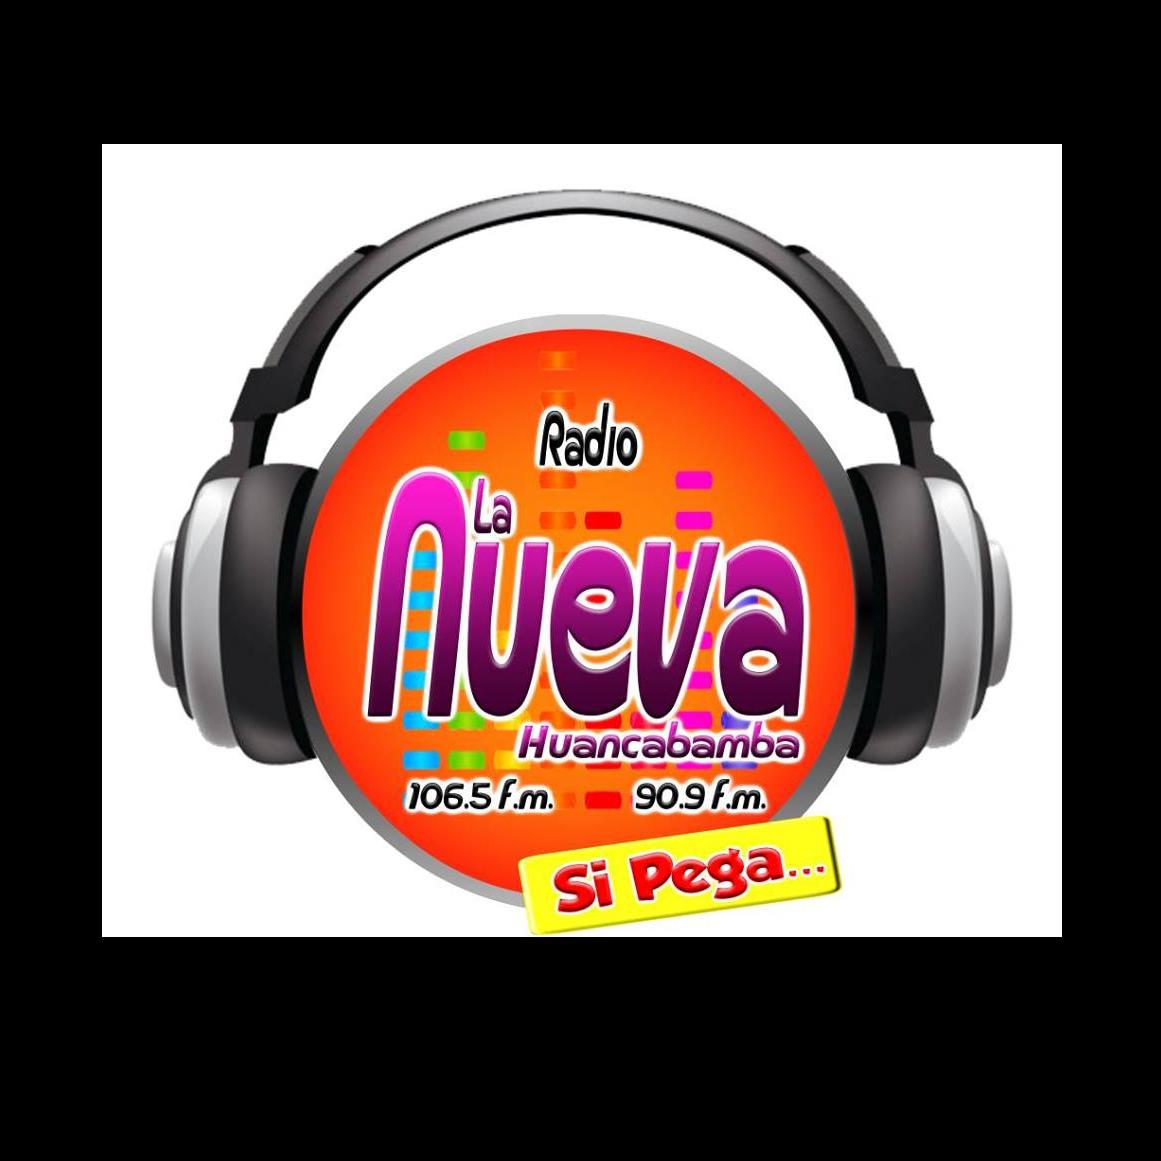 radio la nueva si pega huancabamba